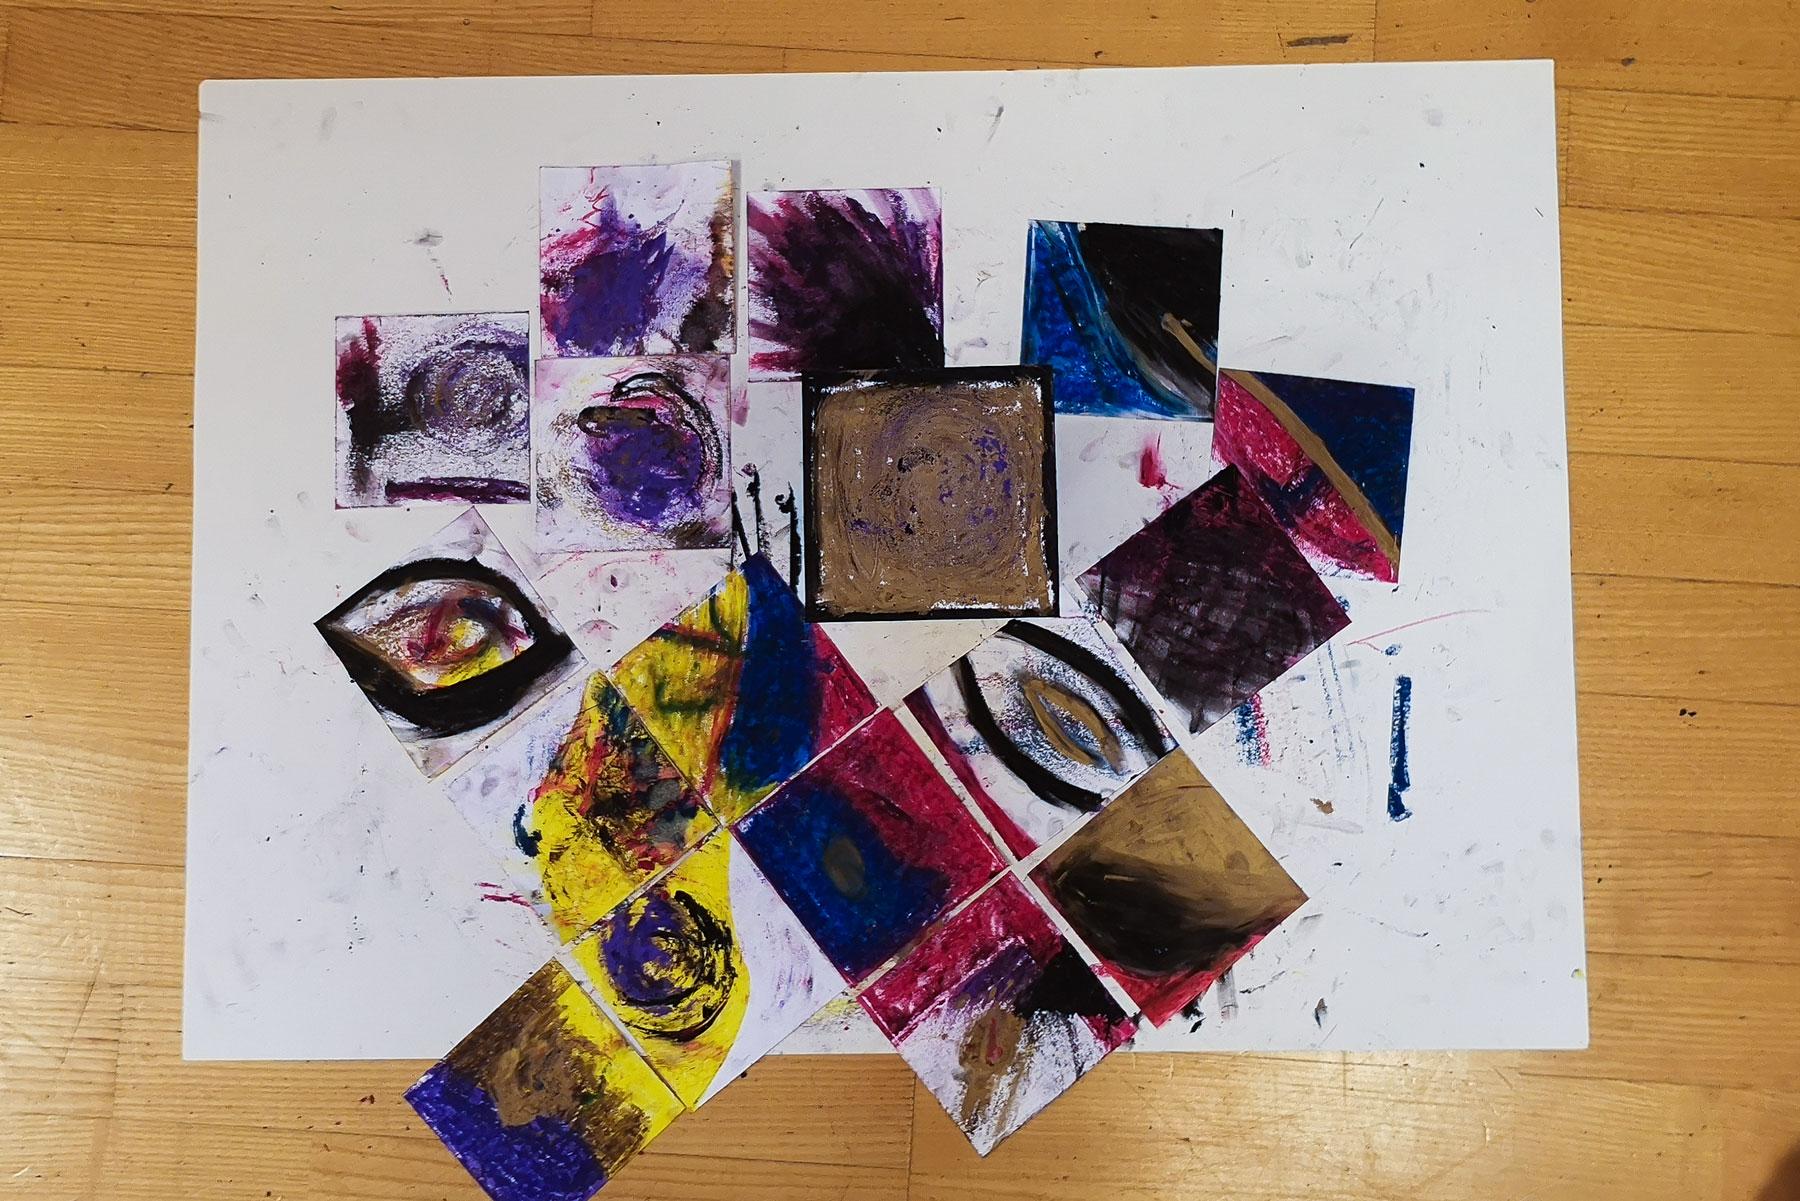 Spontanes Malen psychischer Themen im atelier mishugge des Multimedialen Kunsttherapeuten und Kreativtrainers Andreas Klambauer in Wien 15.